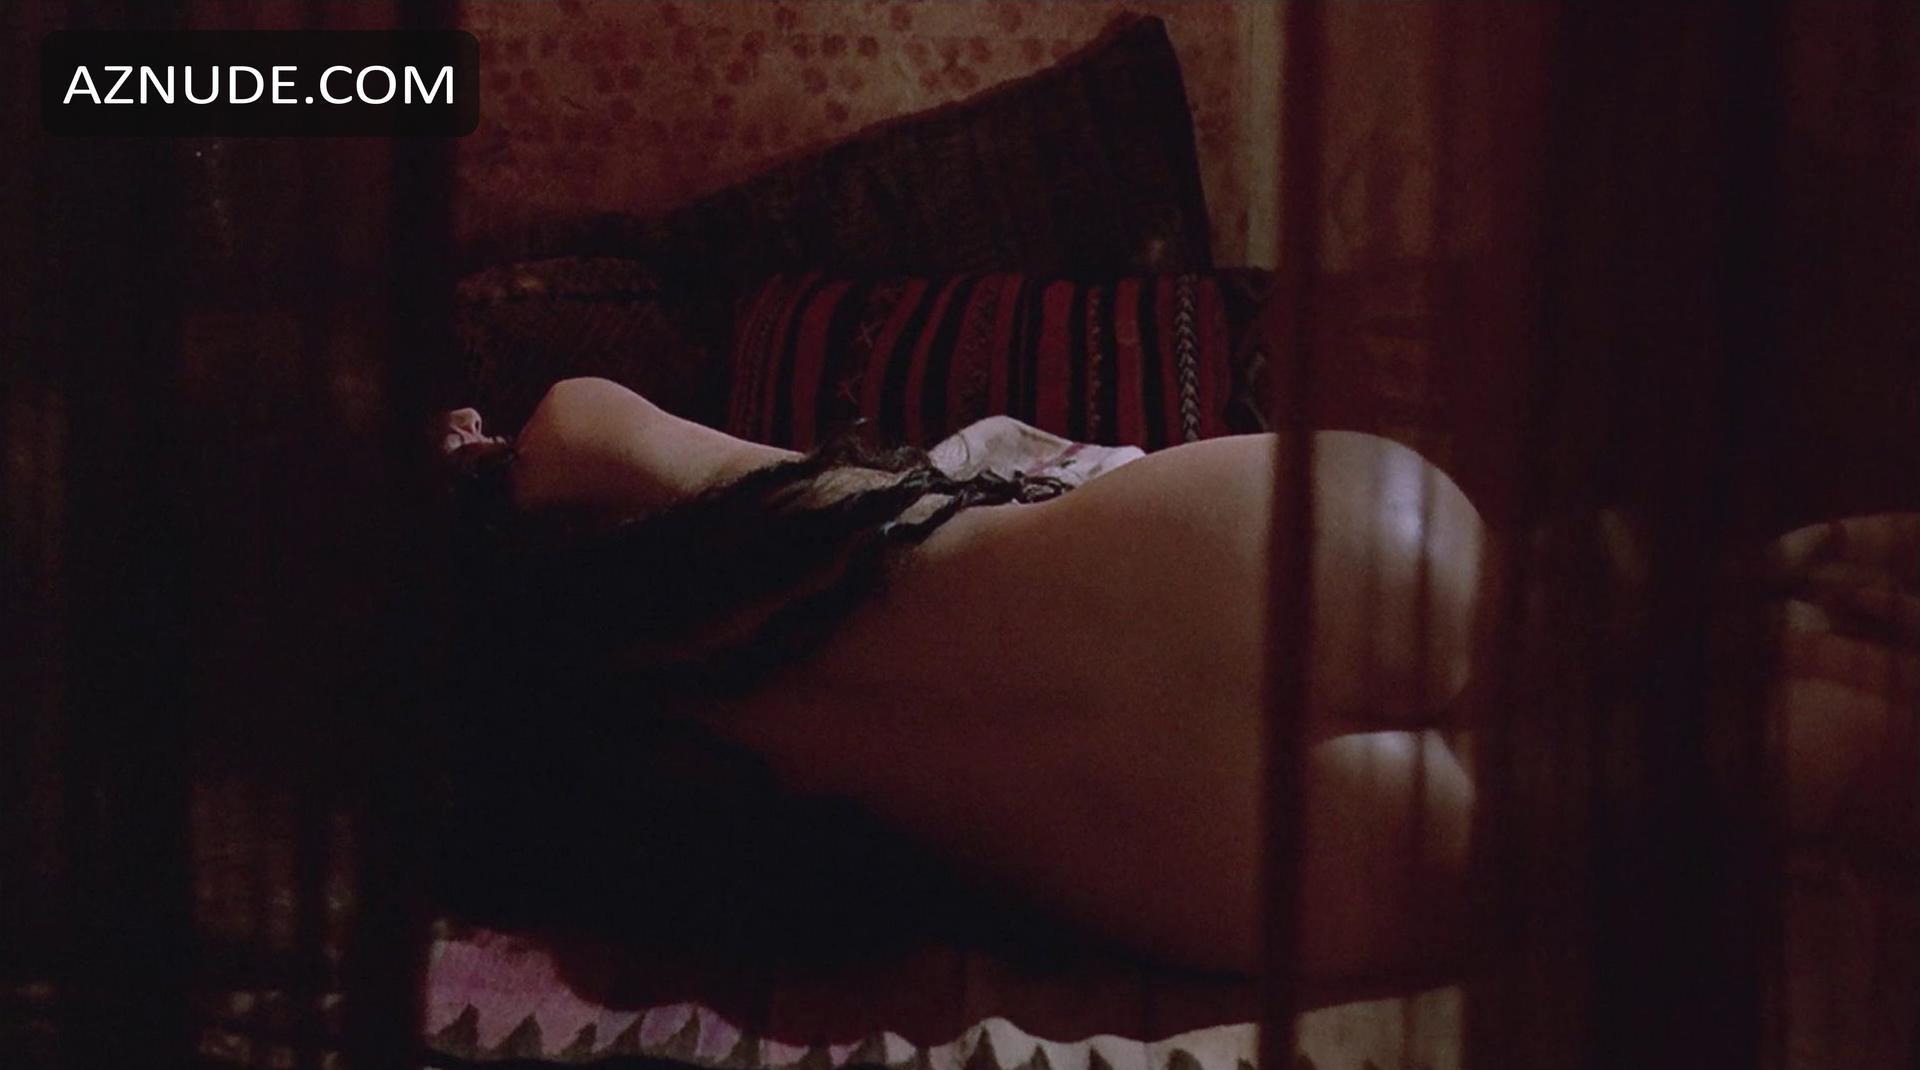 Butt Barbara Hershey nudes (98 photos) Ass, Instagram, see through